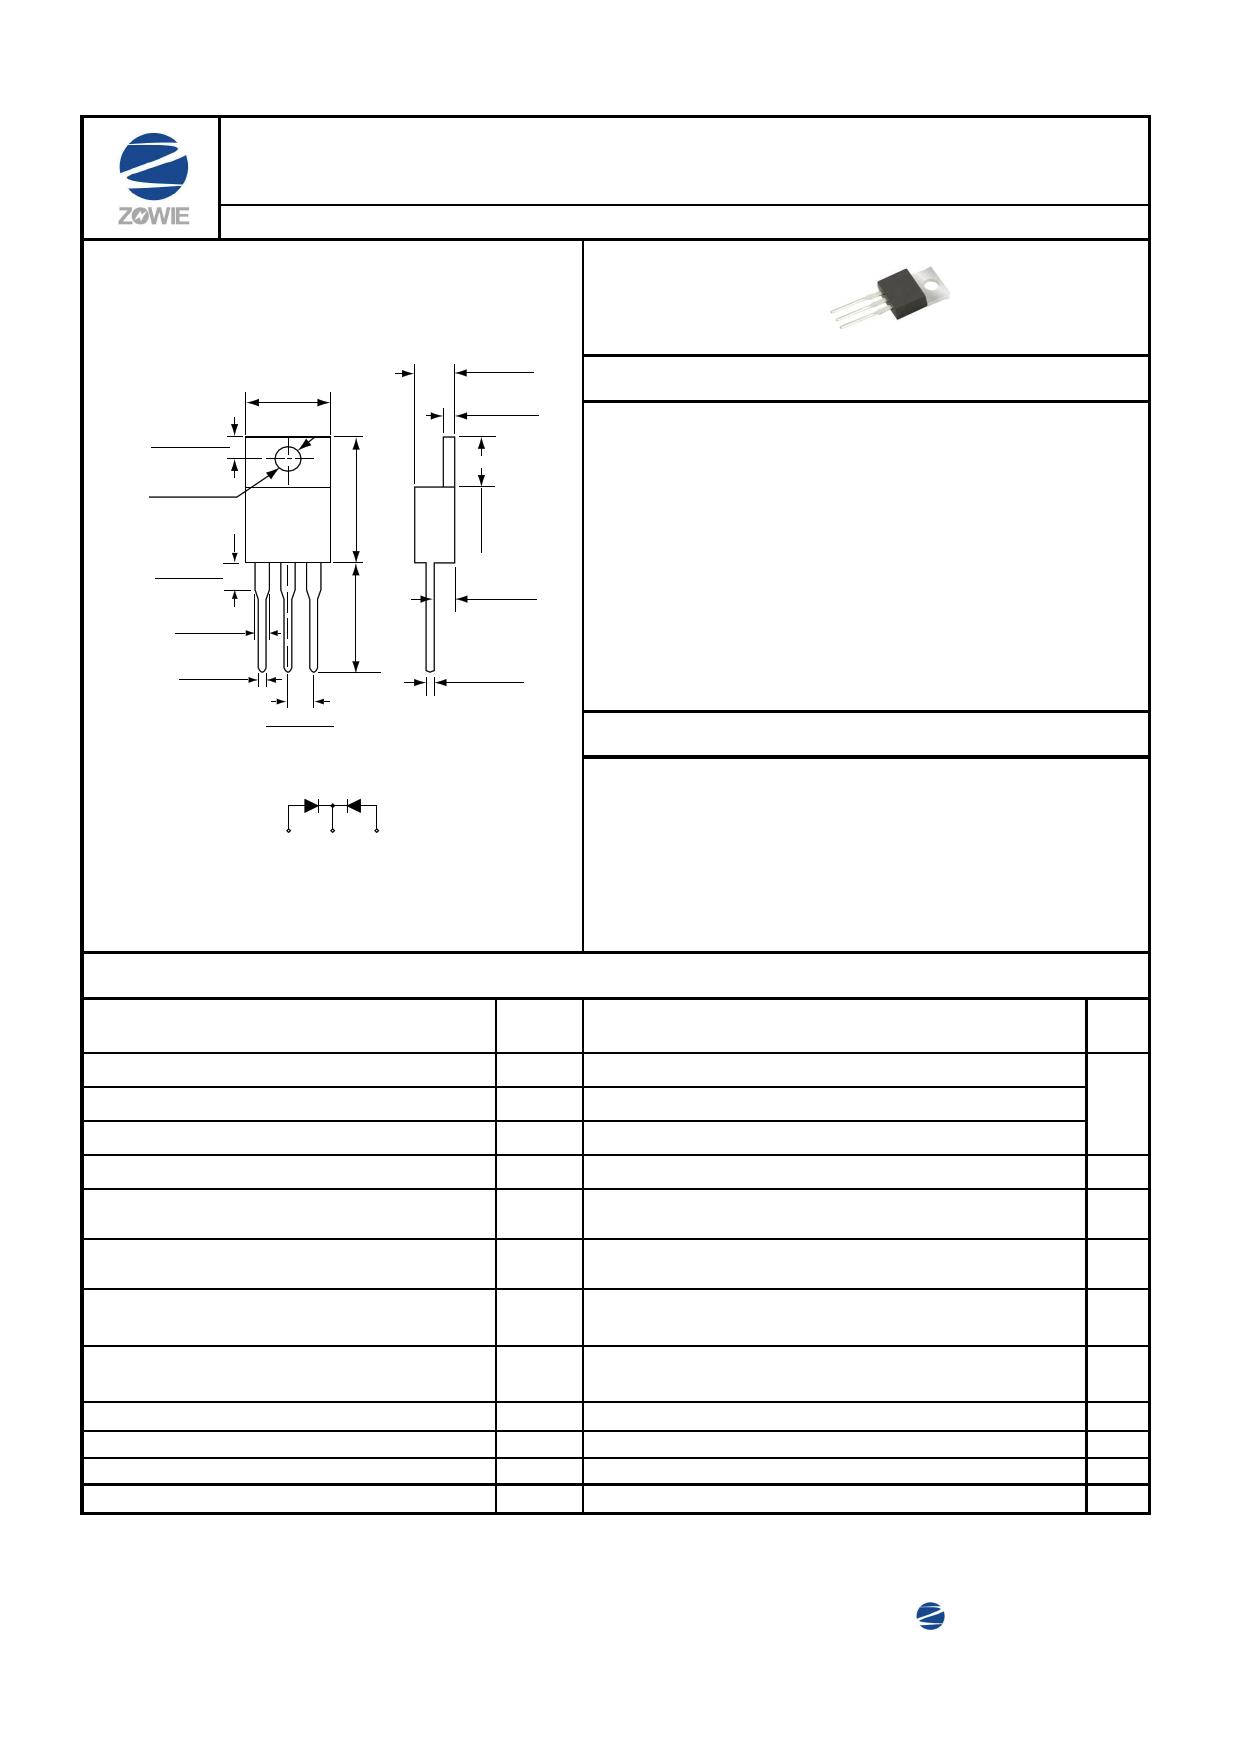 MBR30100CTSH Datasheet, MBR30100CTSH PDF,ピン配置, 機能